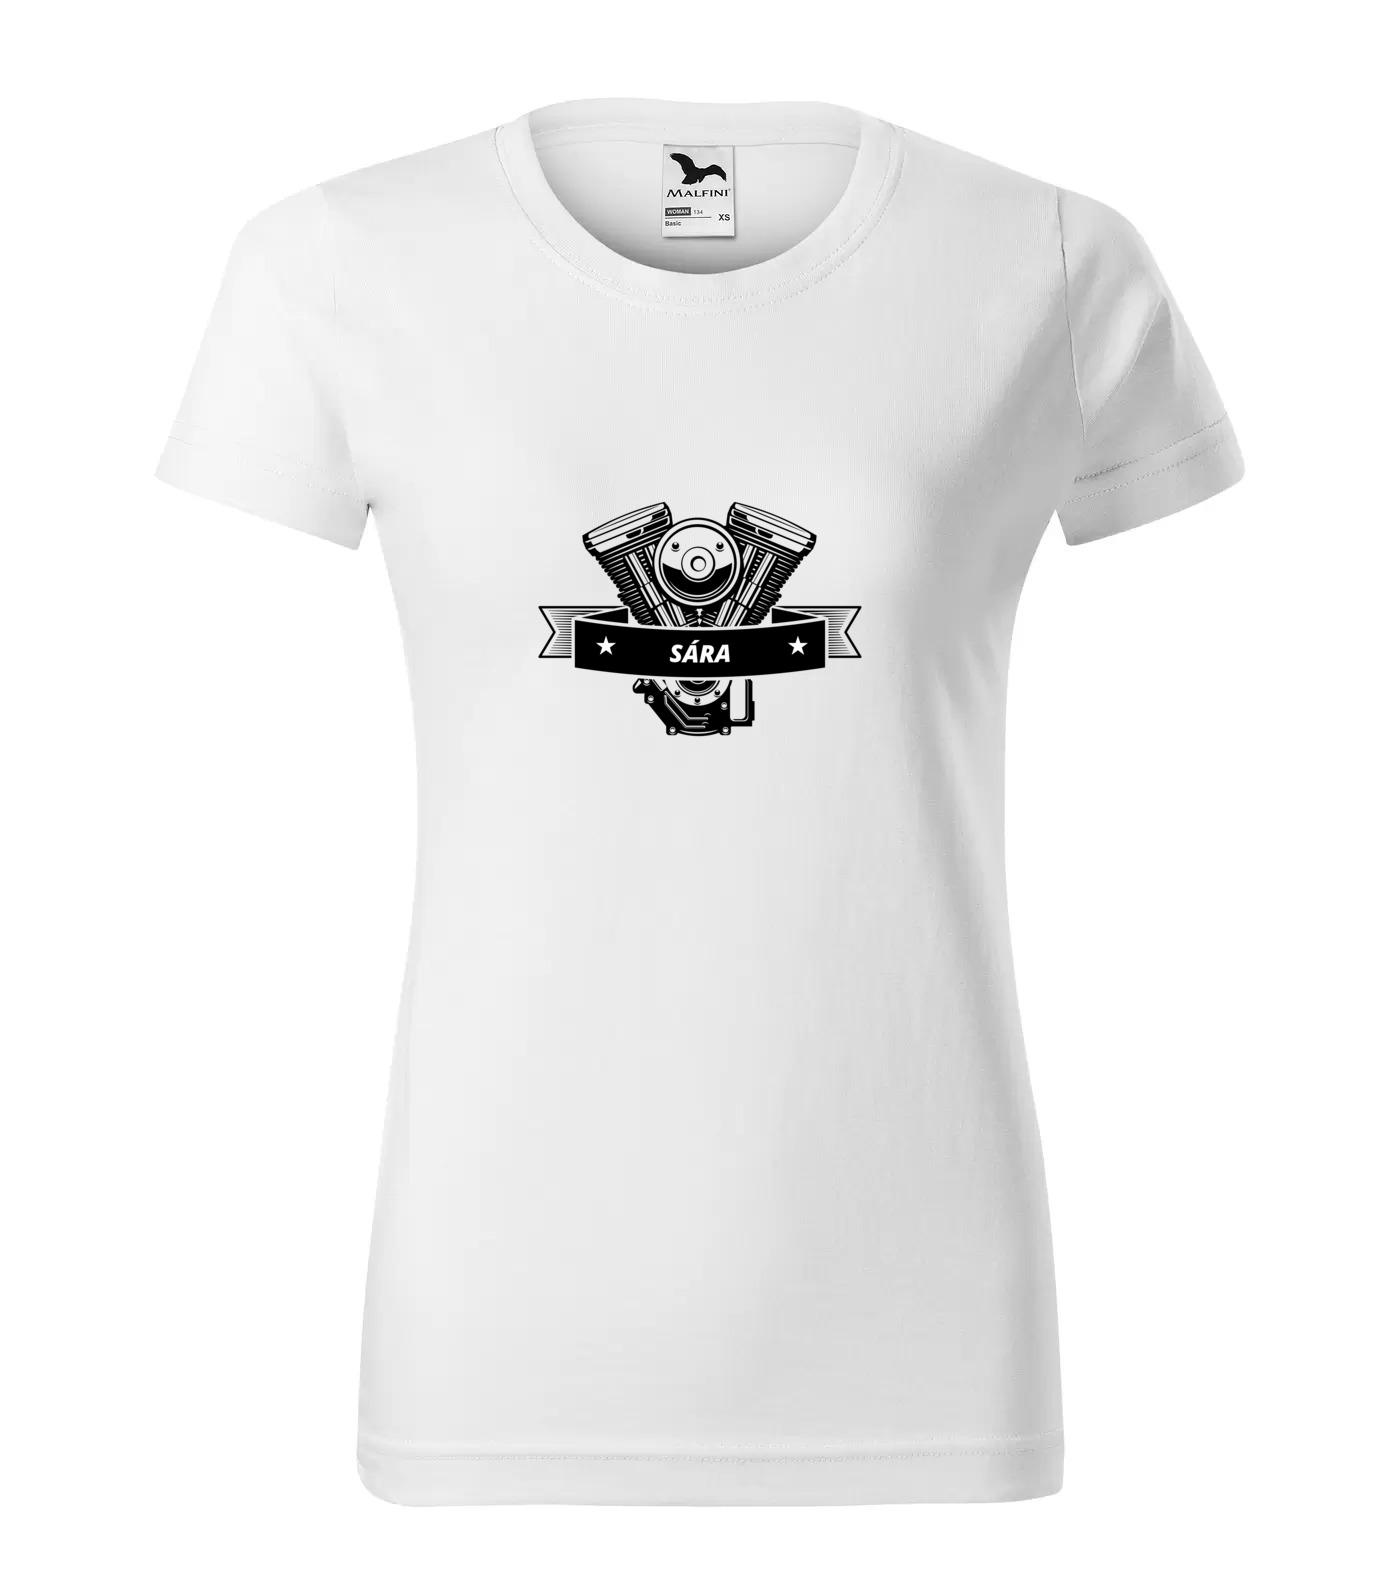 Tričko Motorkářka Sára